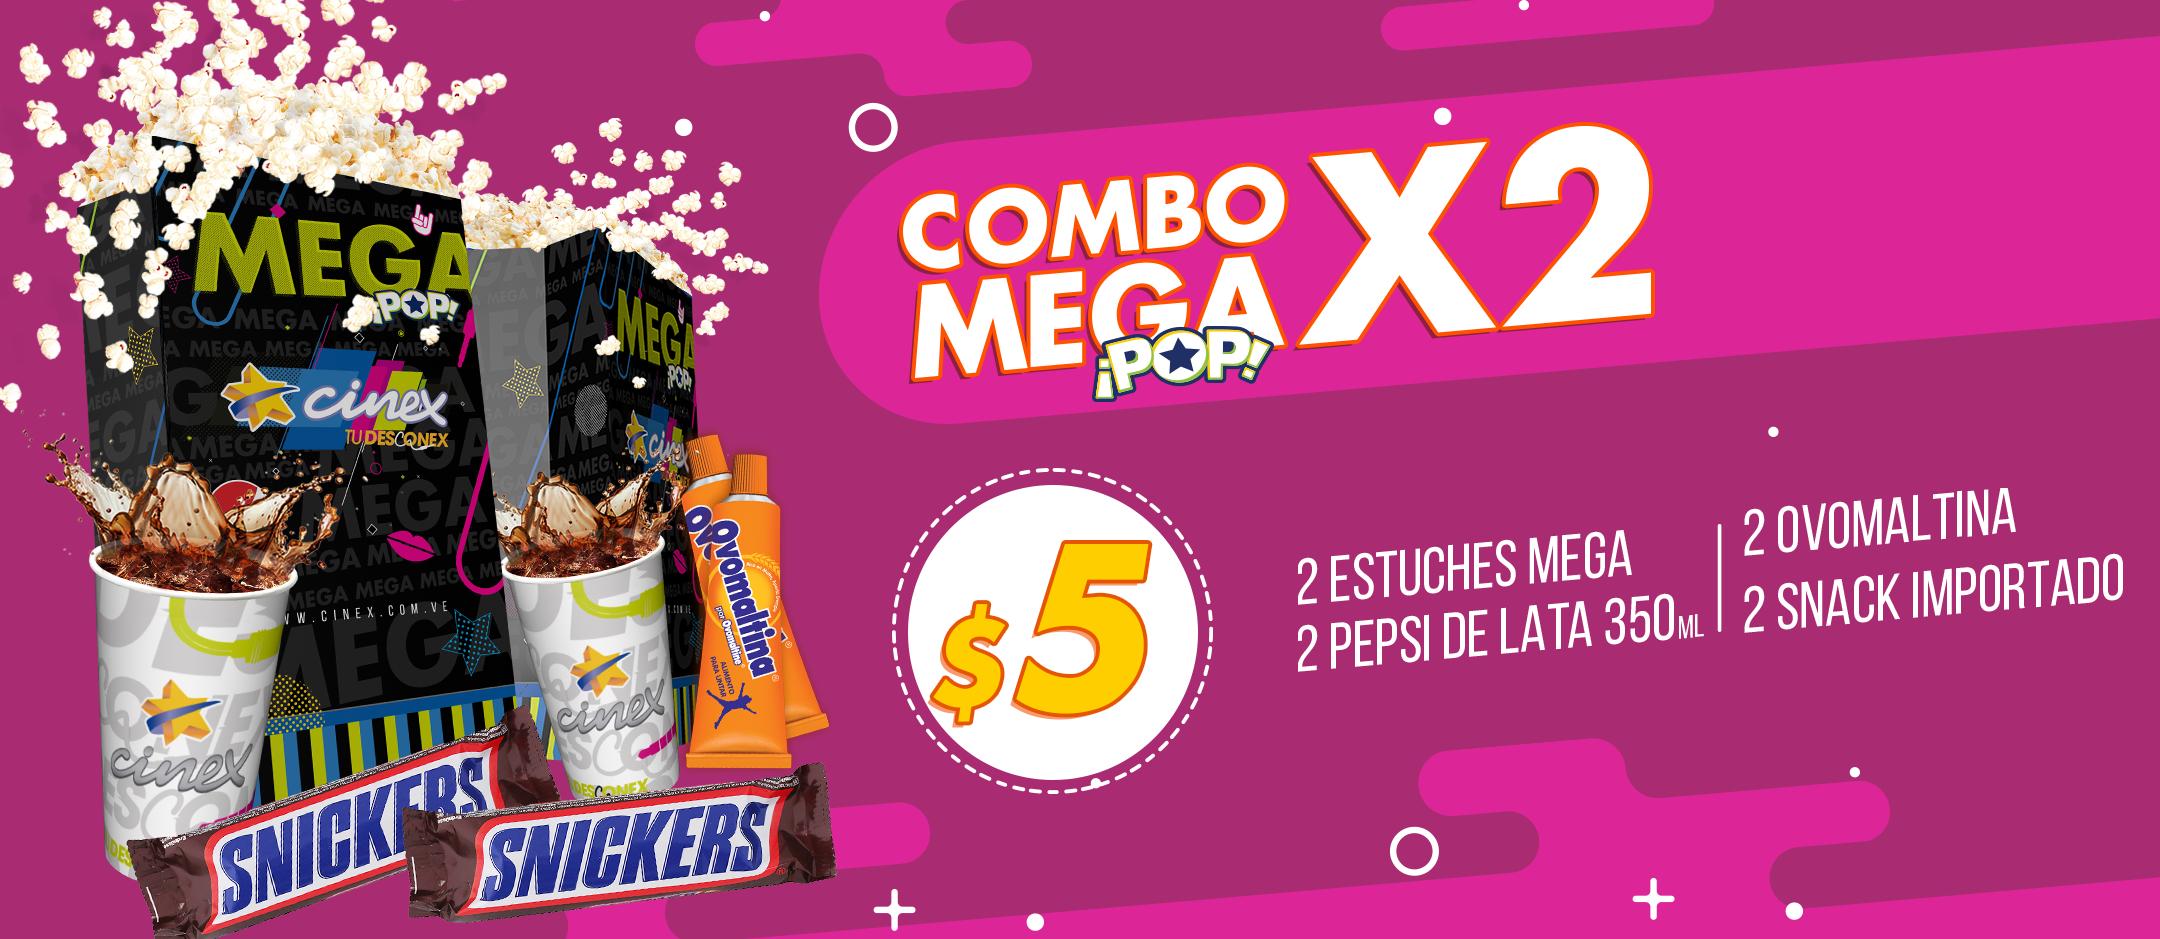 13 Cinex combo x2